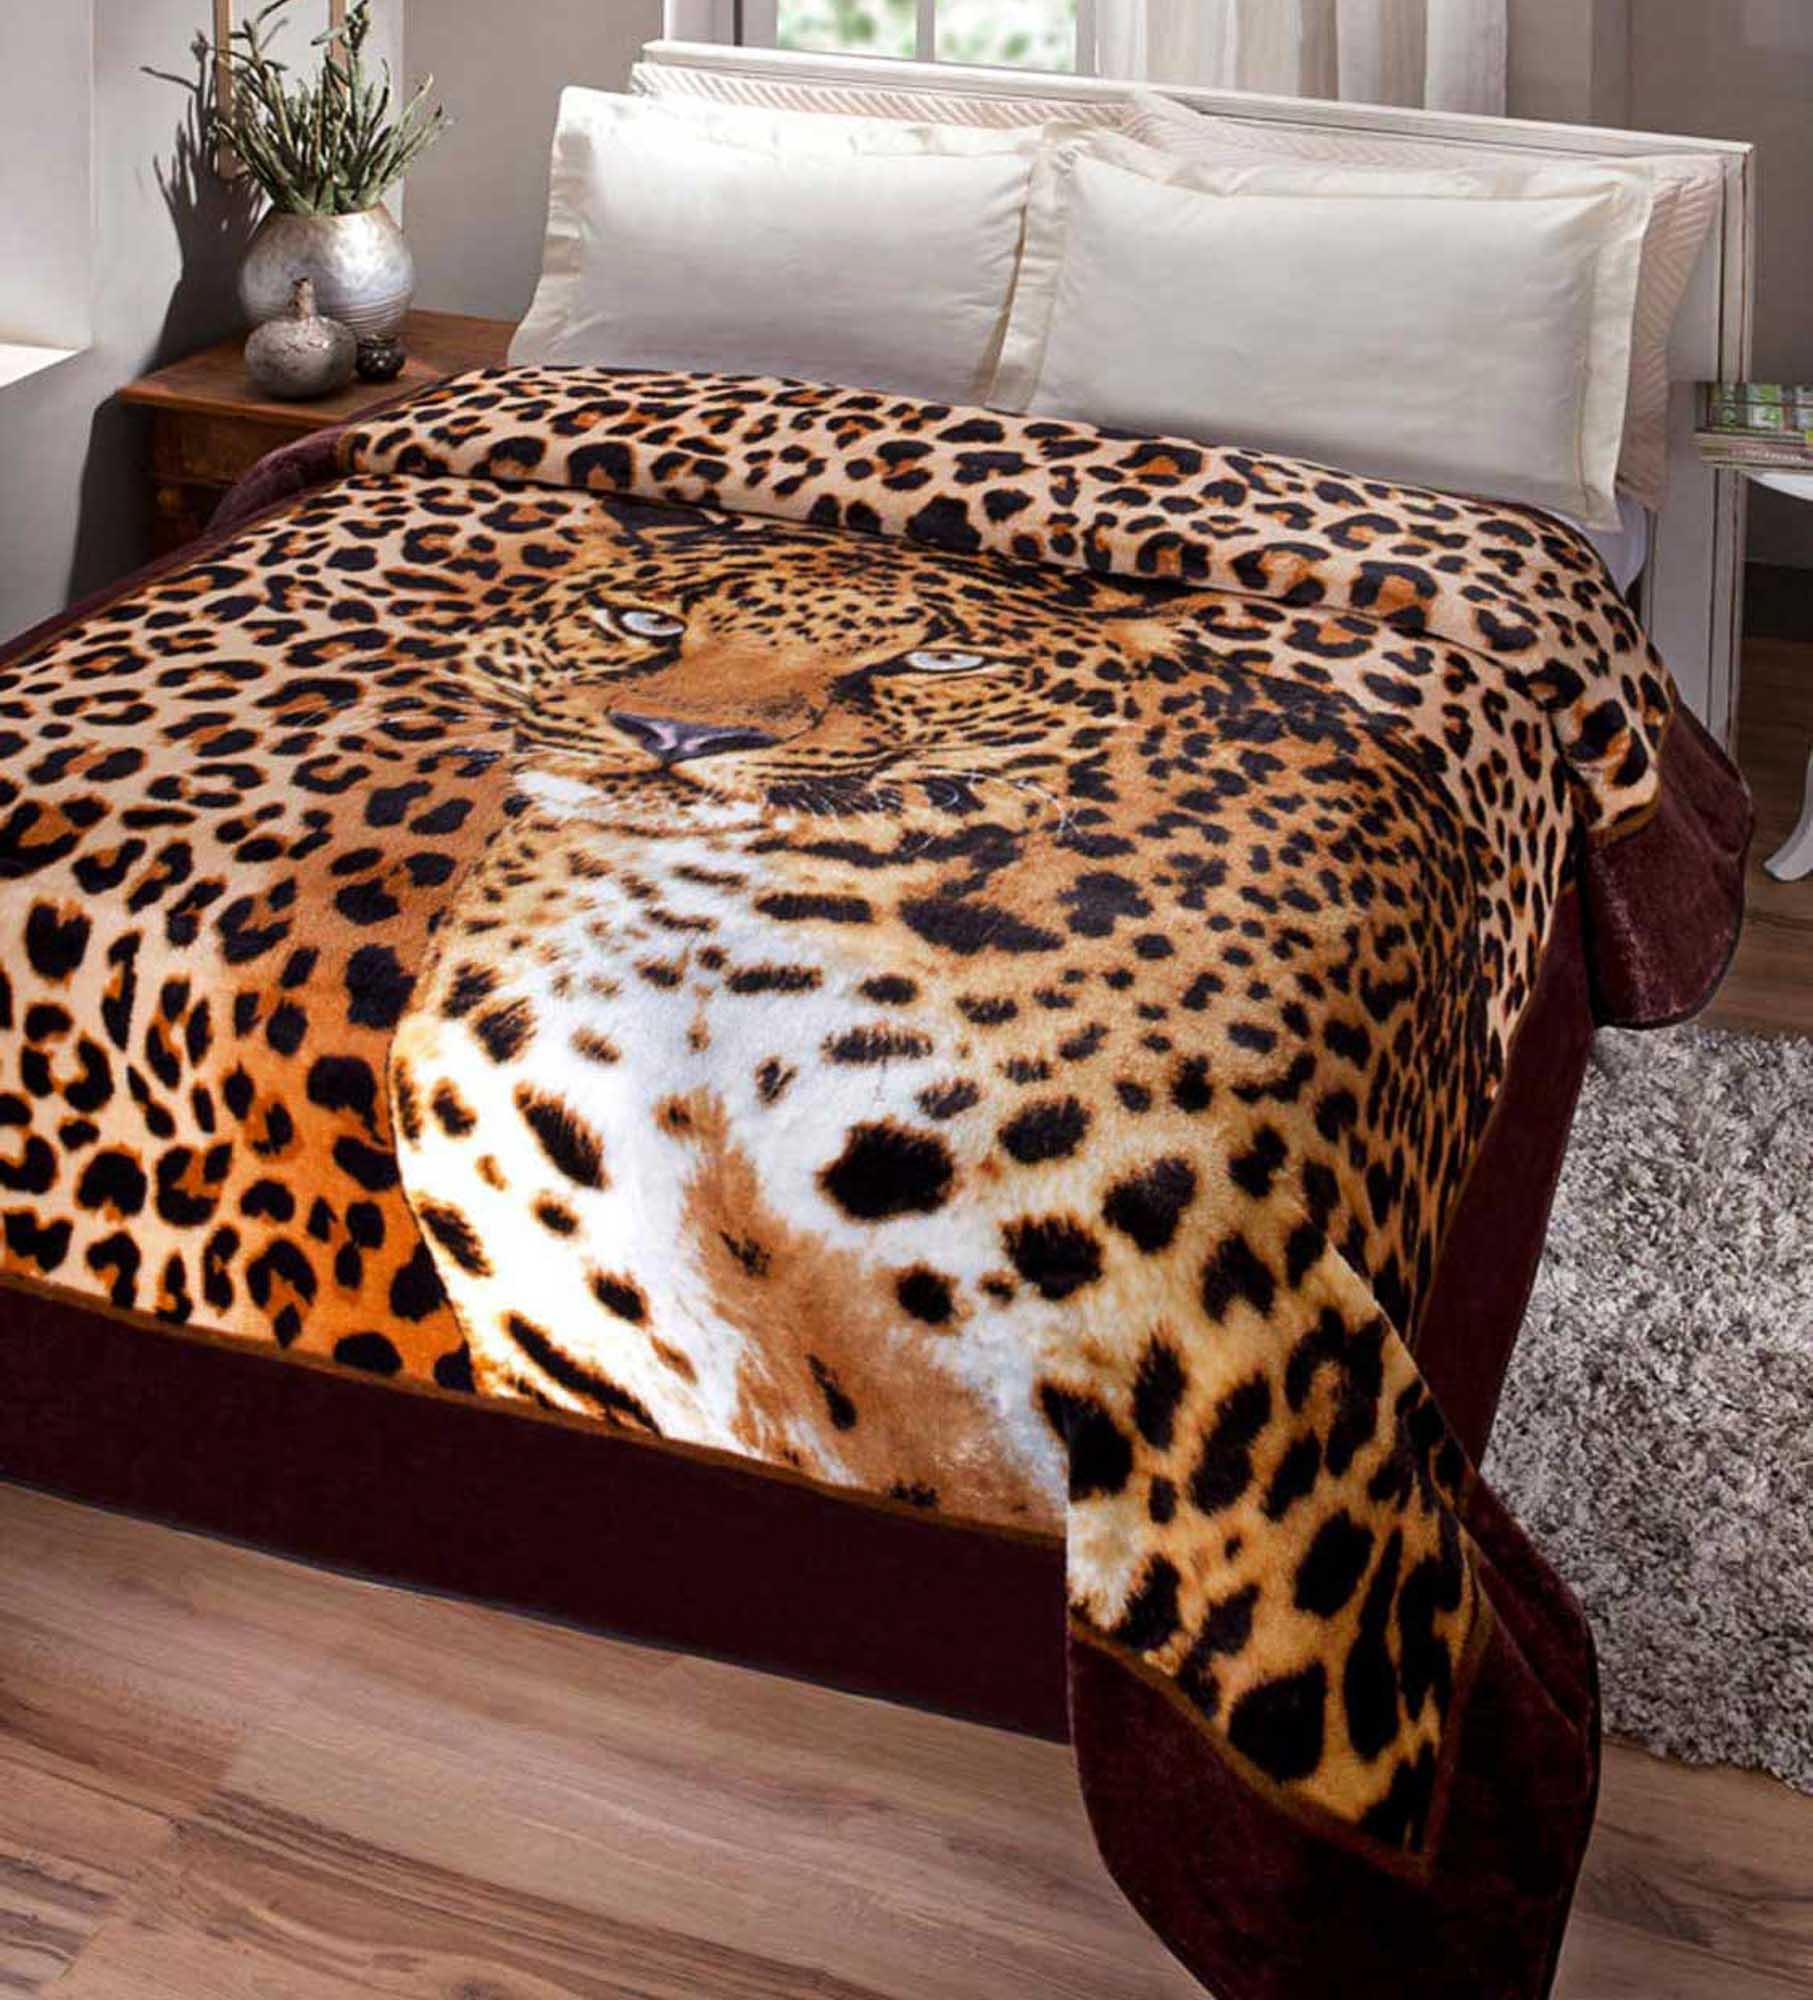 Cobertor Jolitex Casal Kyor Plus 1,80x2,20m Leopardo